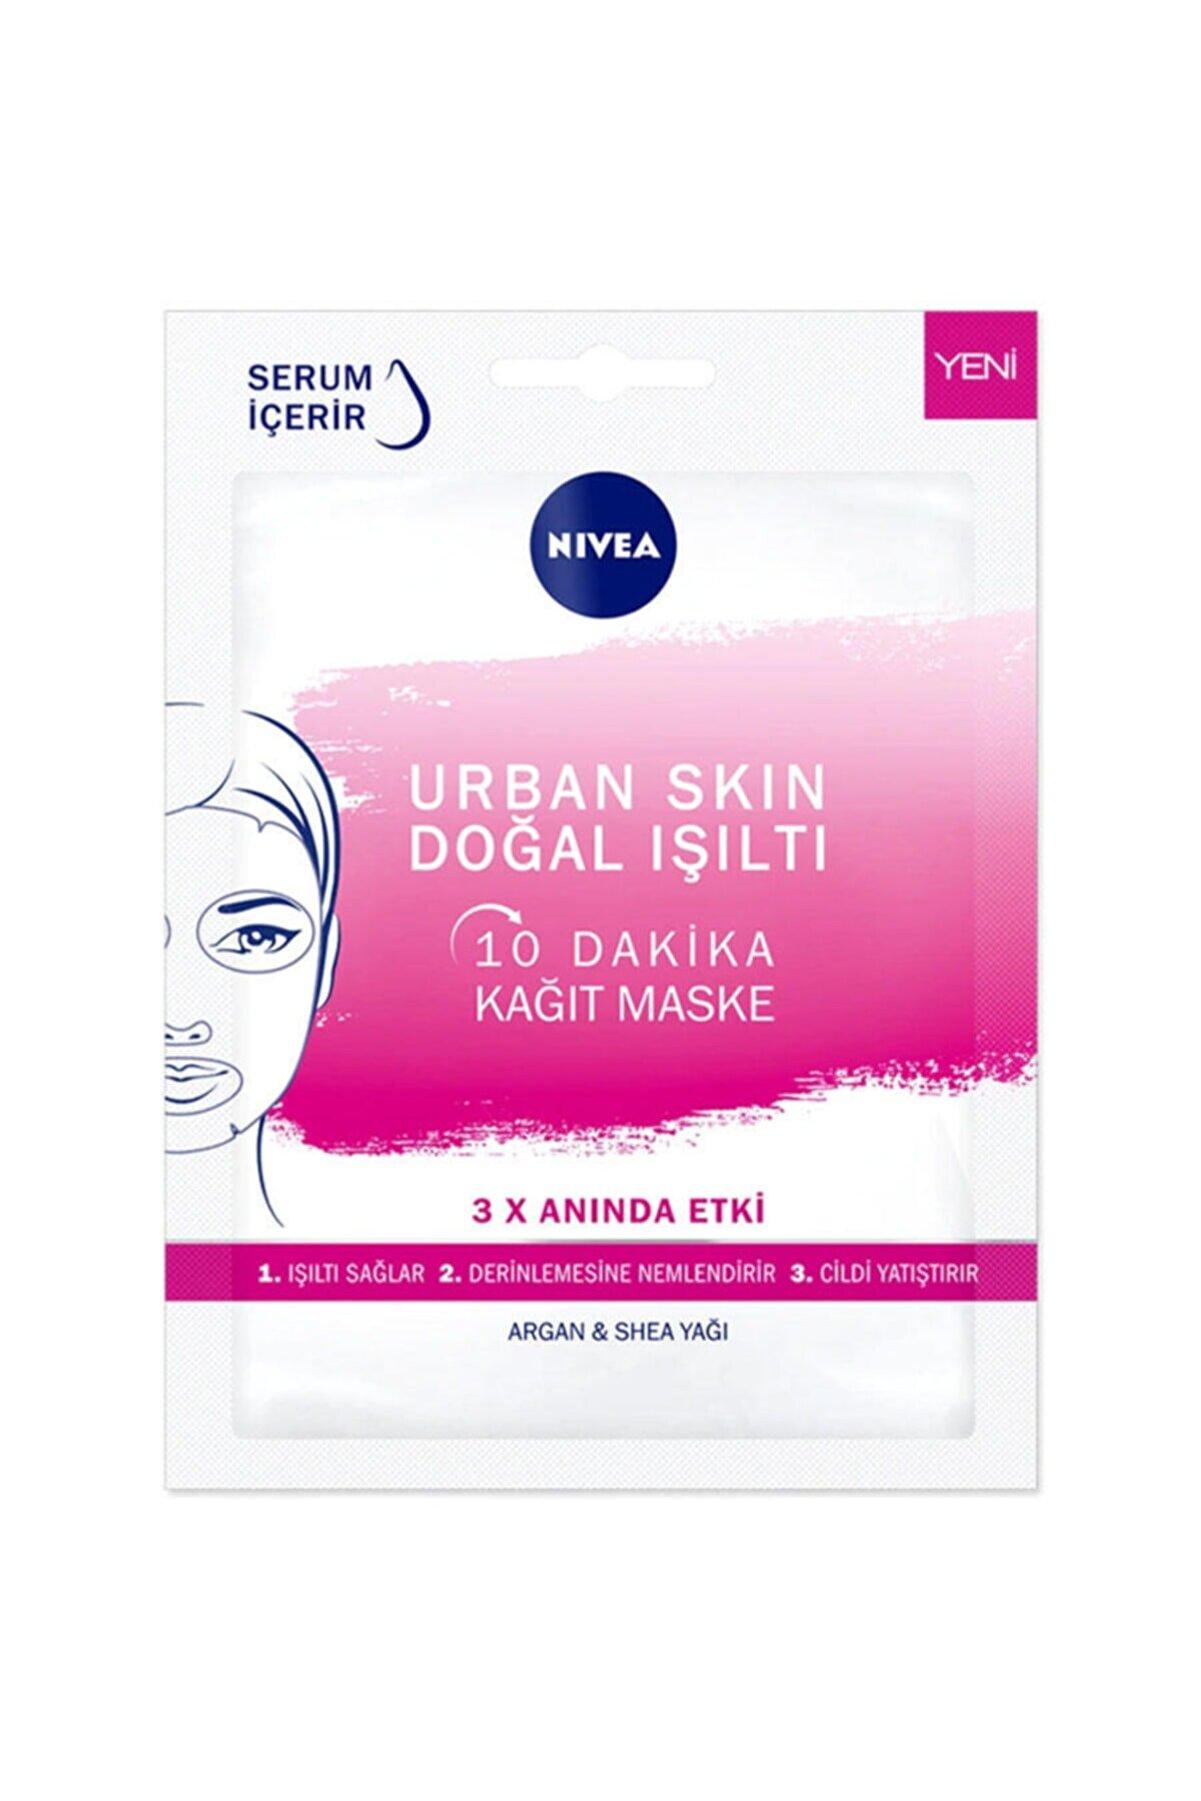 Nivea 10 Dakika Urban Skin Doğal Işıltı Kağıt Yüz Maskesi